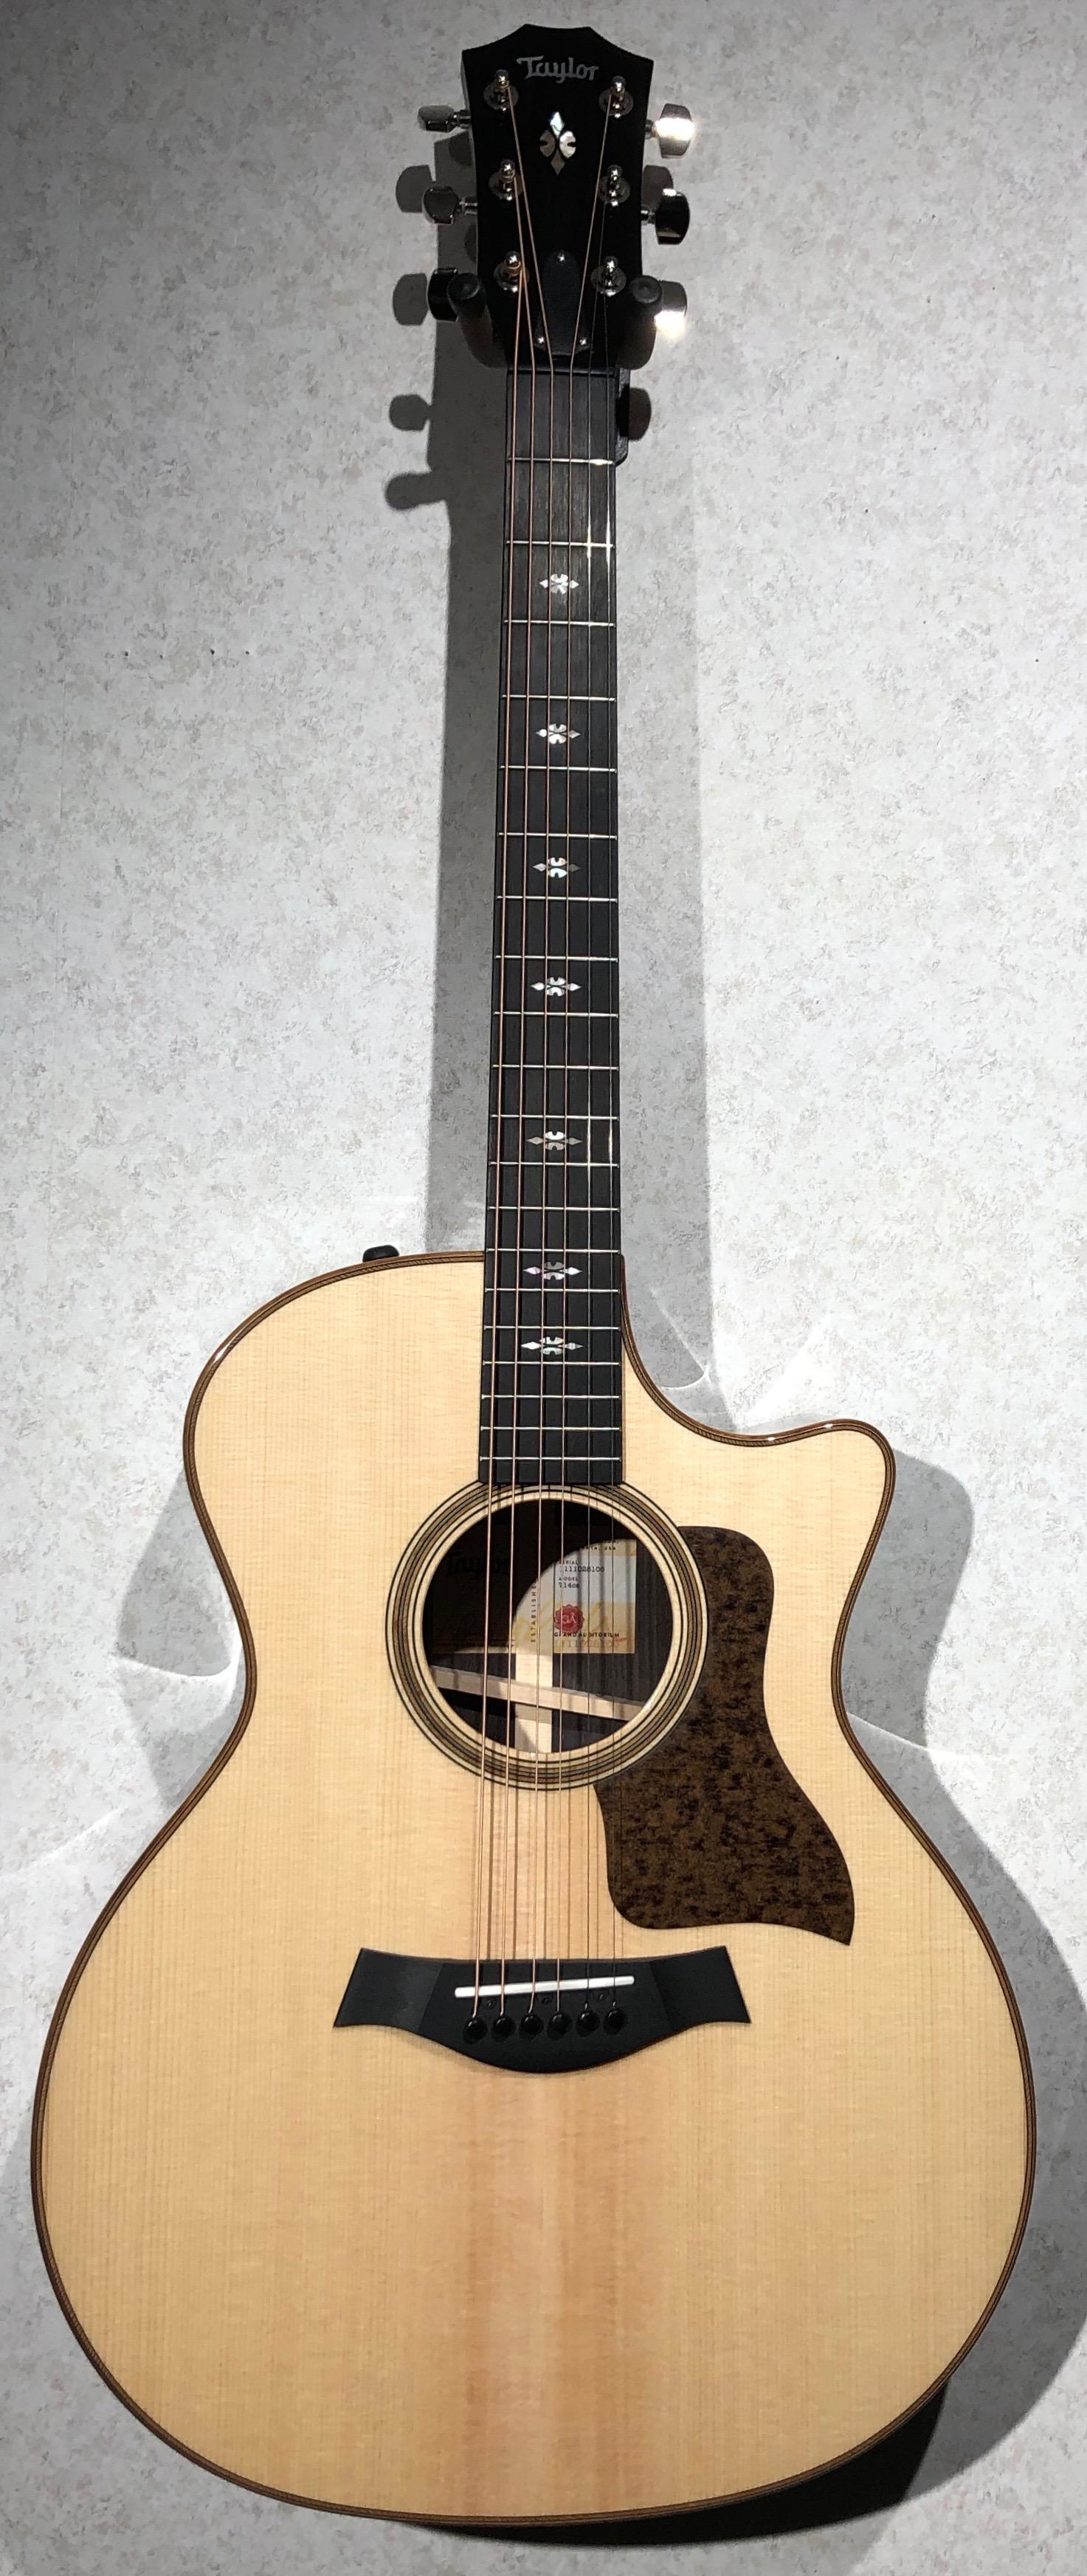 taylor guitars 714ce v class legacy music. Black Bedroom Furniture Sets. Home Design Ideas